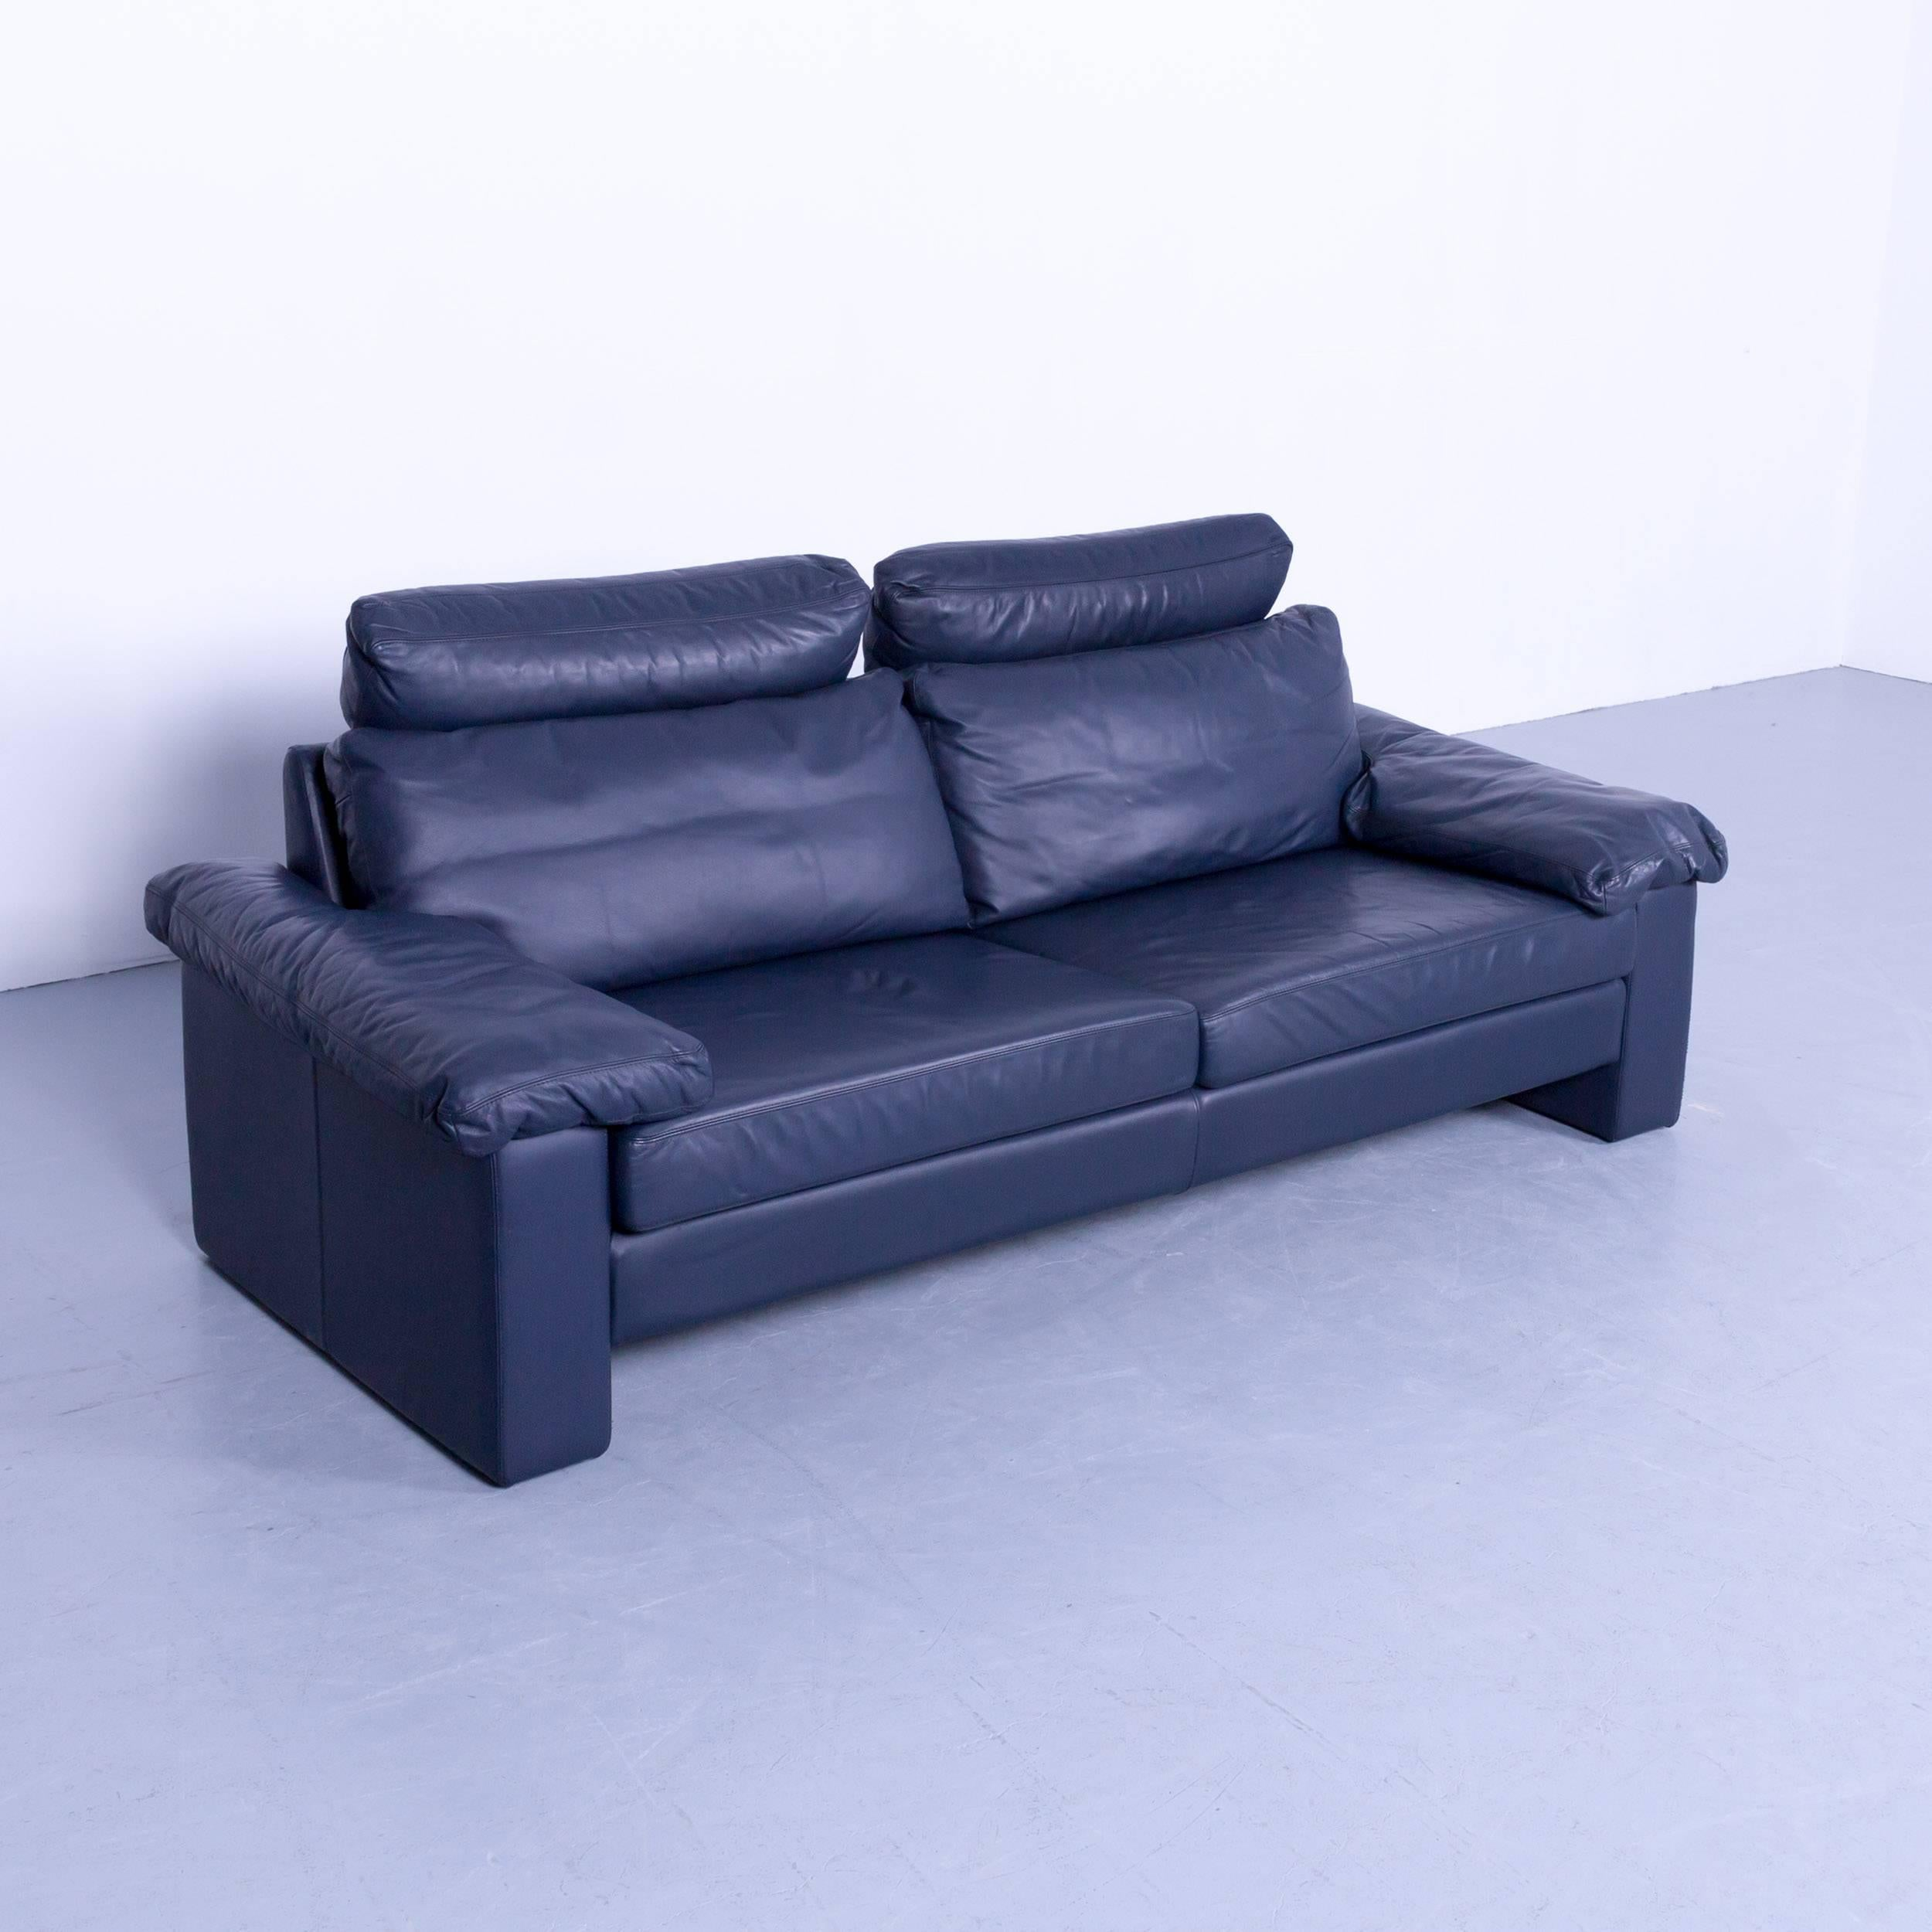 COR Conseta Designer Sofa Leather Blue Three-Seat Couch Modern